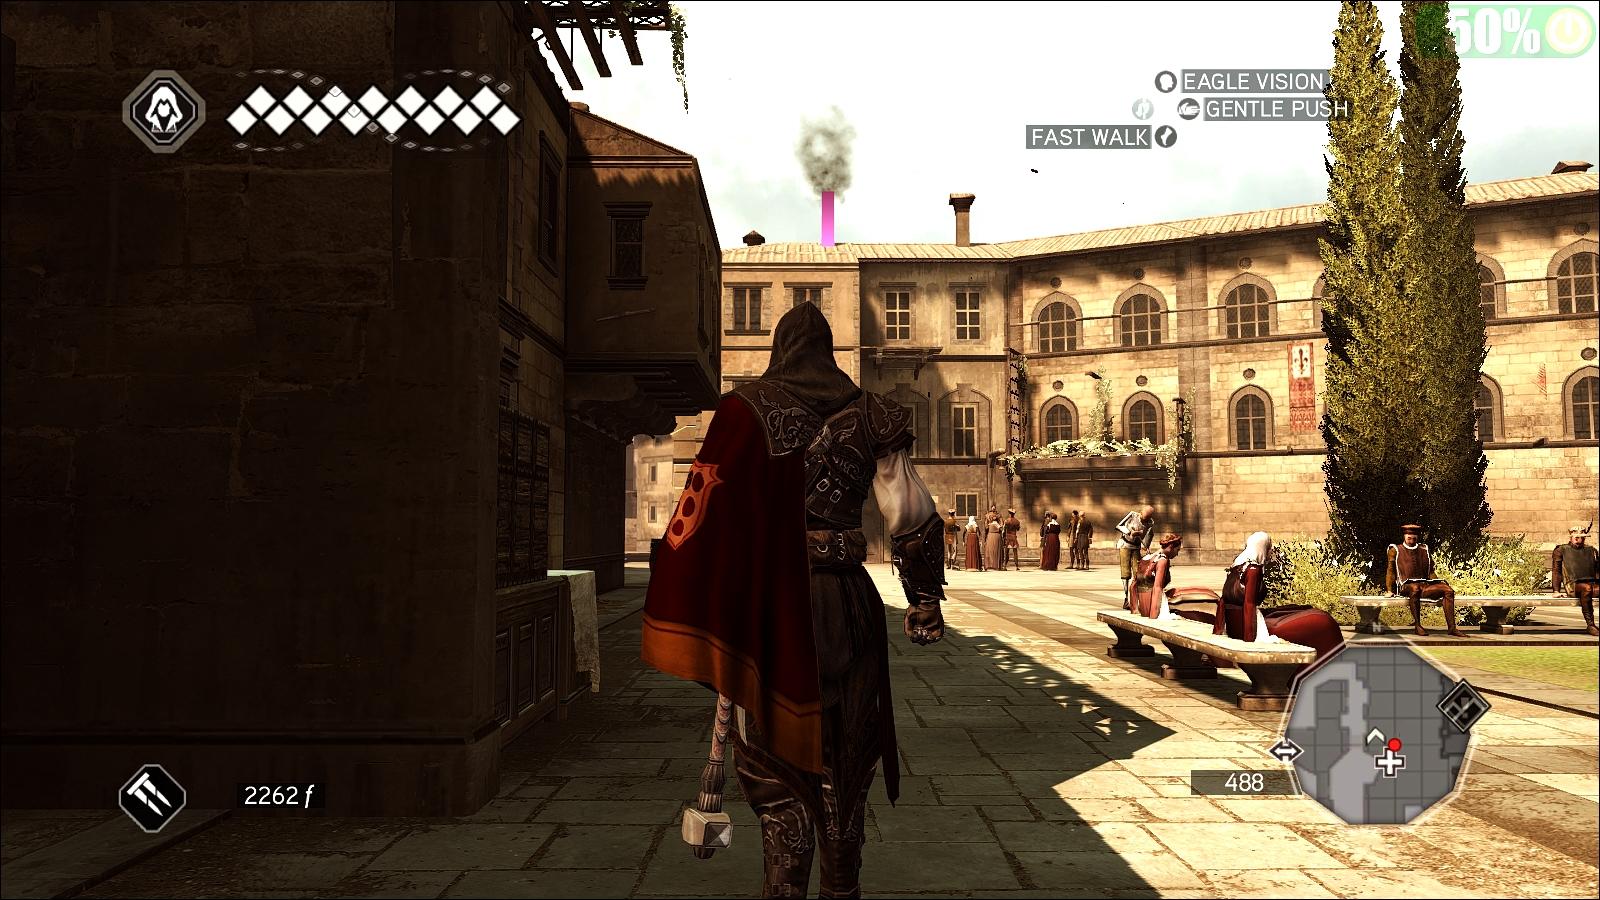 AssassinsCreedIIGame.exe_DX9_20140211_163843.jpg